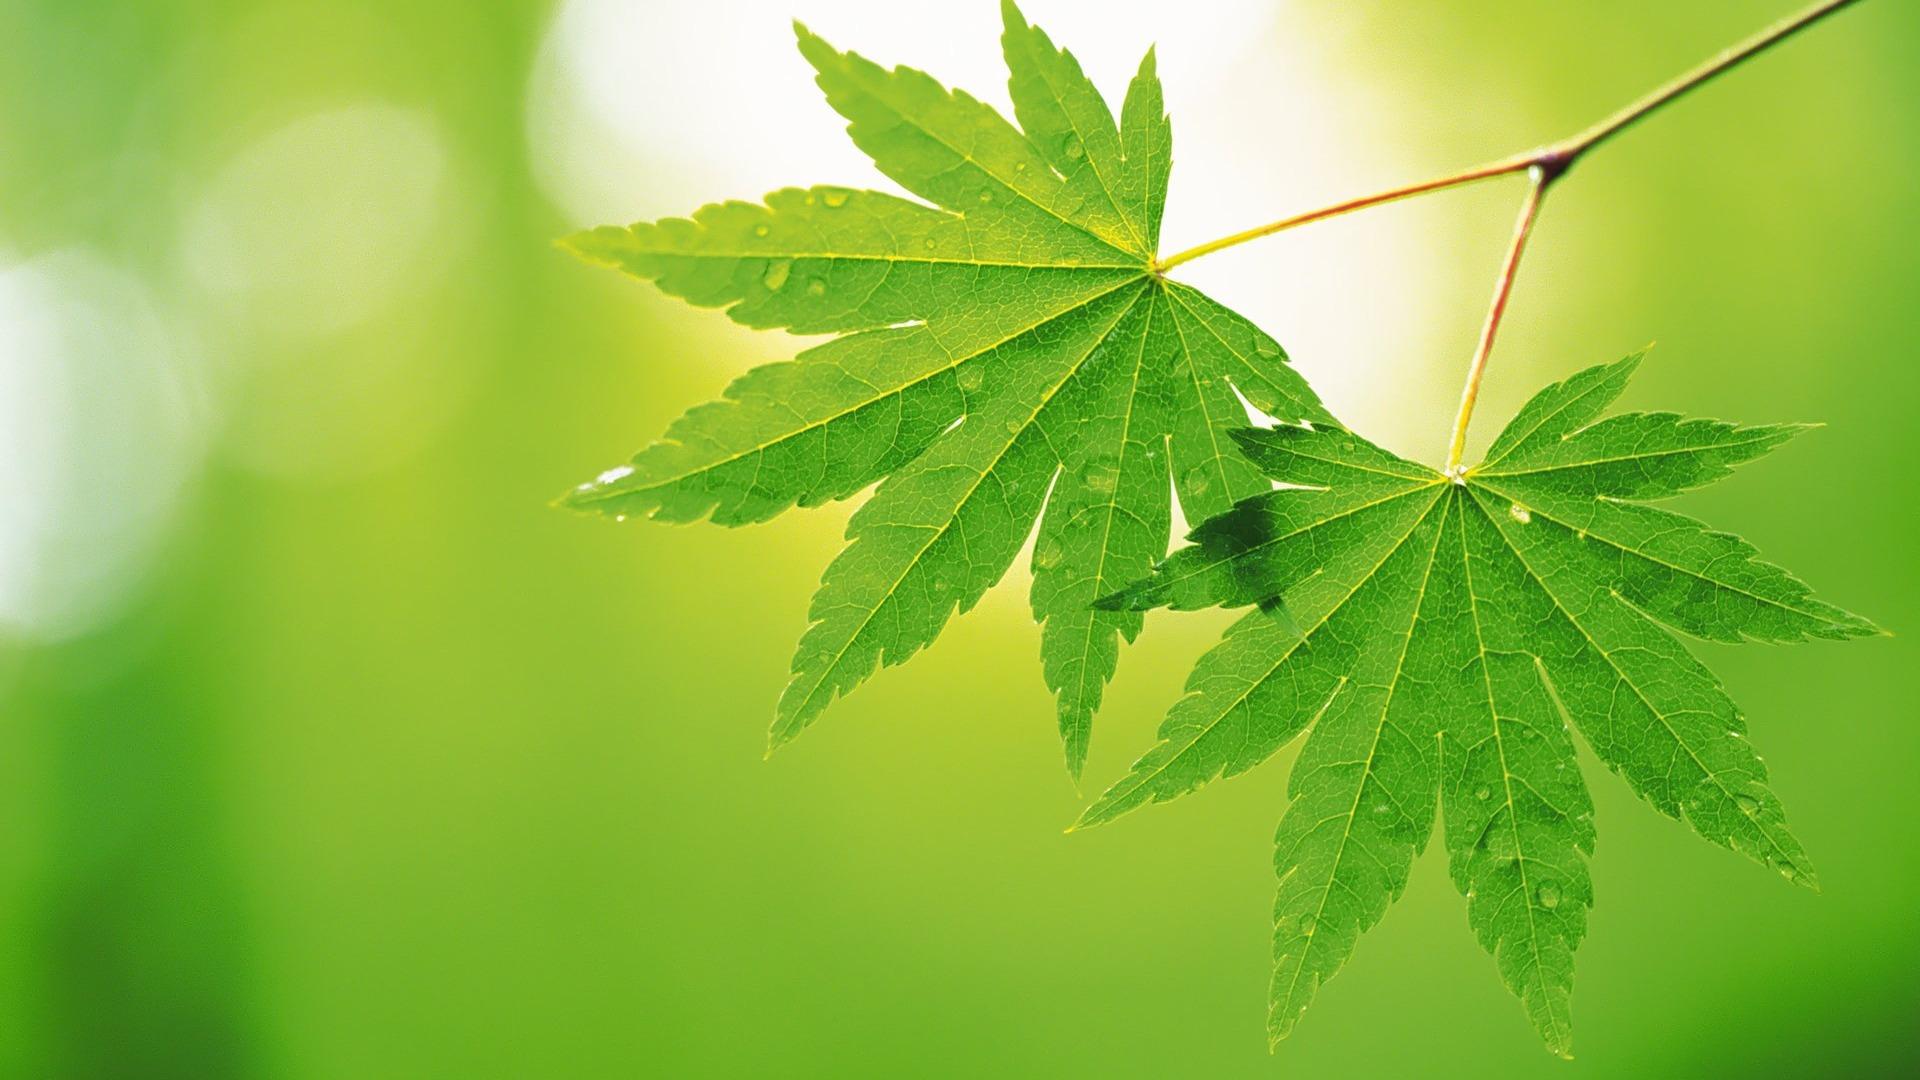 Free Leaf Wallpaper